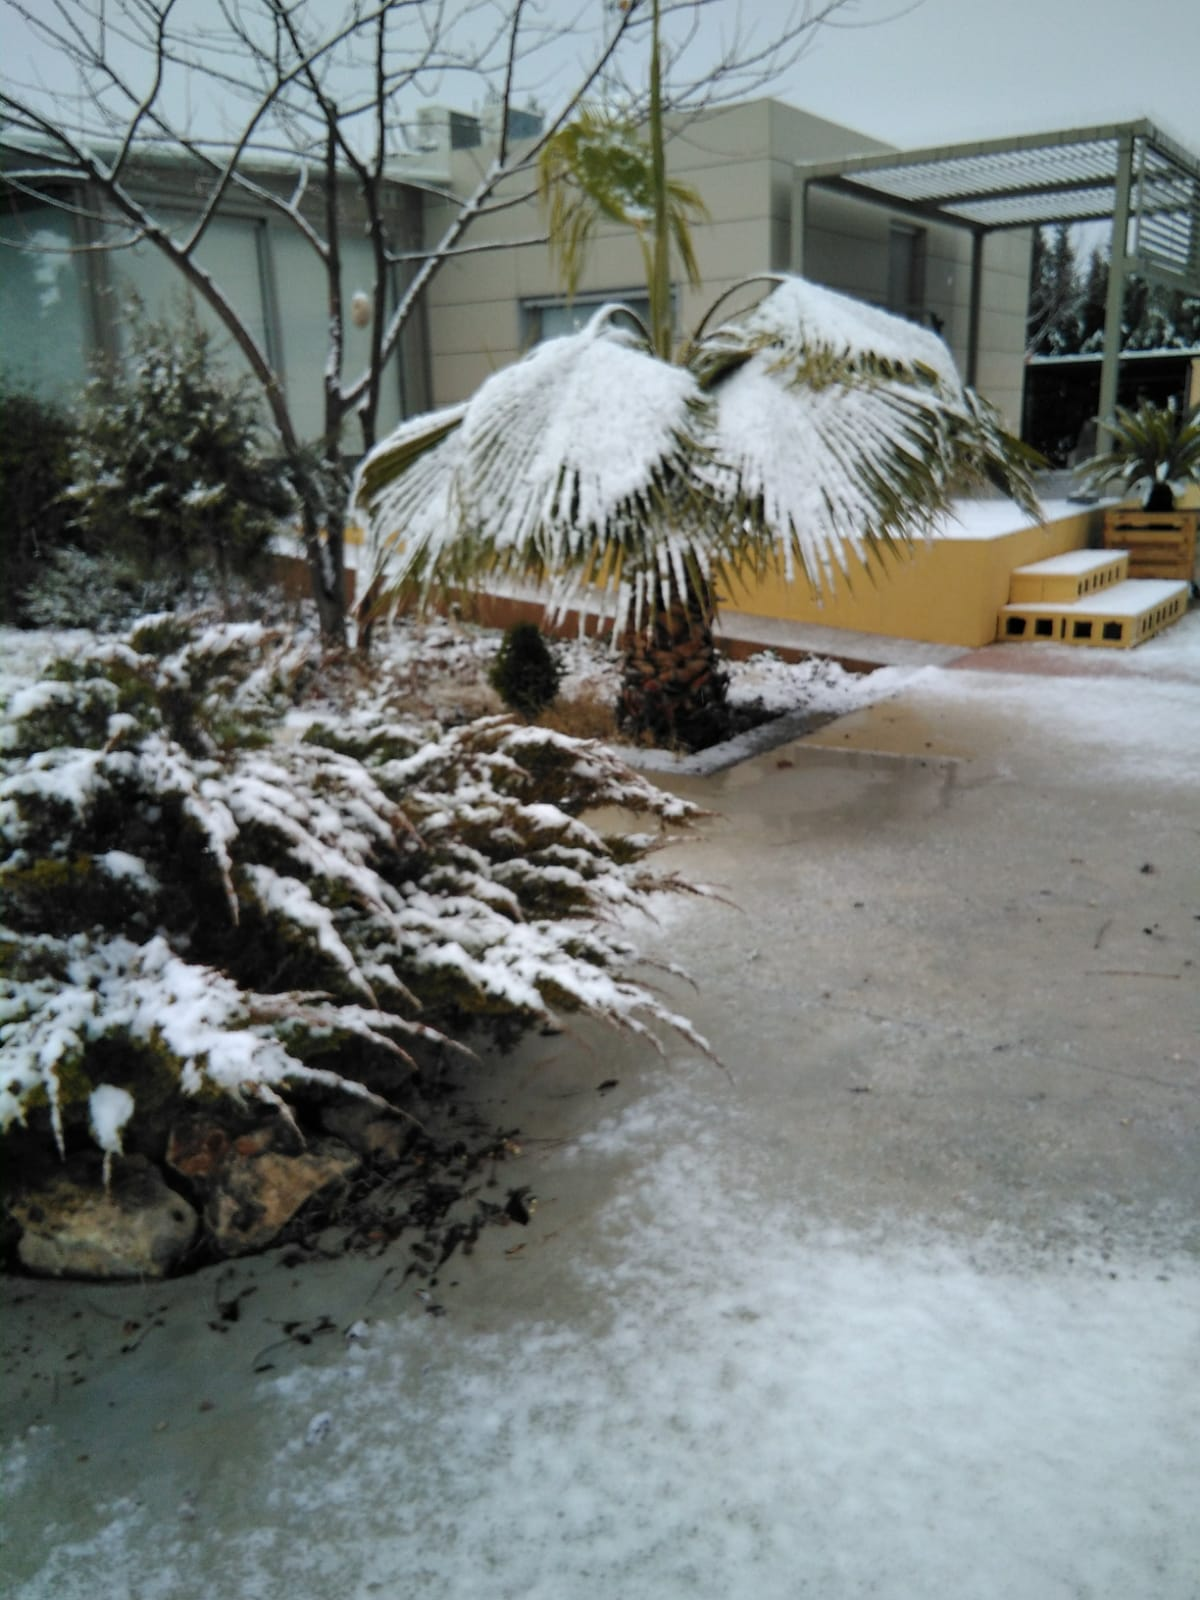 Casita nevada. Enero 2021